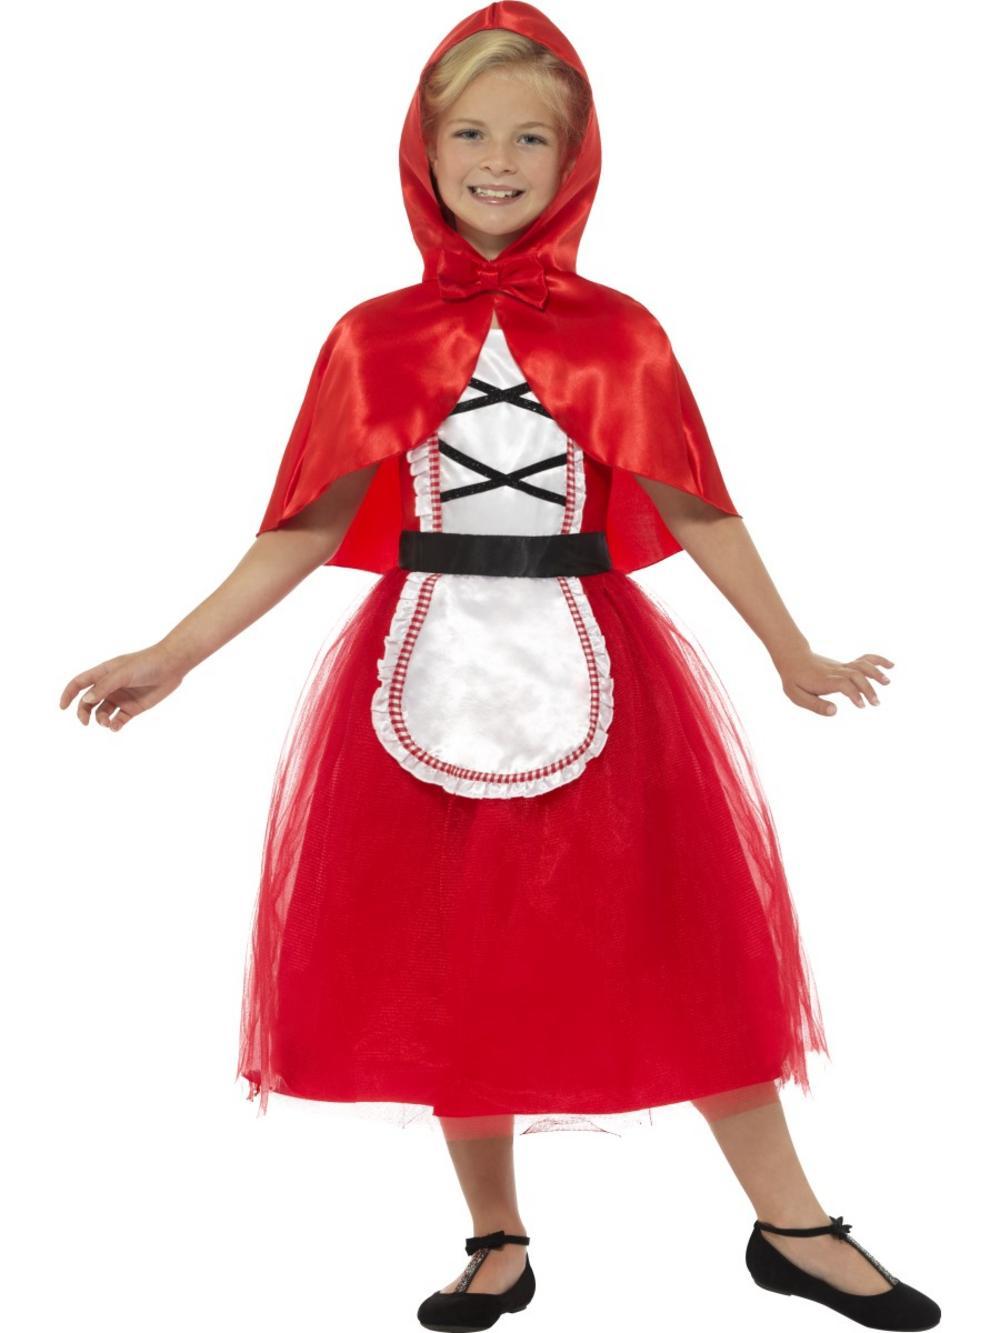 Deluxe Red Riding Hood Girls Fancy Dress